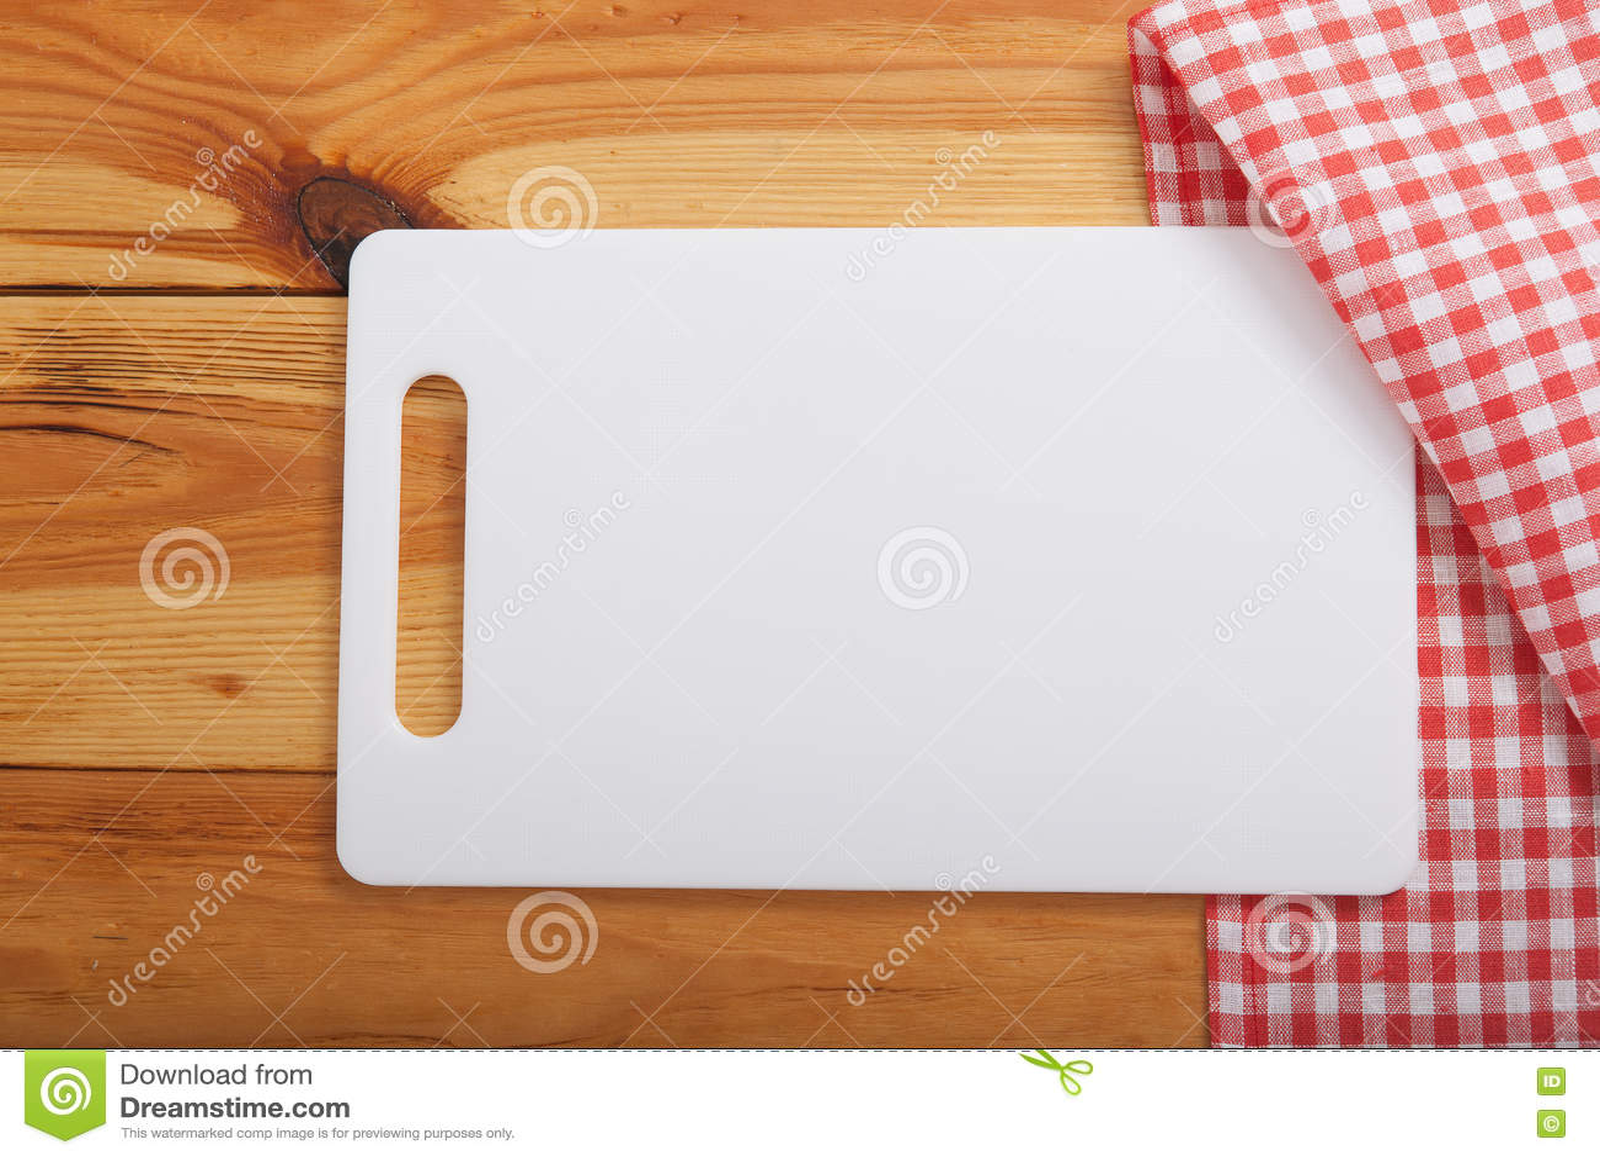 towel for kitchen pictures of granite countertops and backsplashes 在毛巾的切板在木厨房用桌上顶视图库存图片 图片包括有菜单 餐巾 背包 倒空在毛巾的白色切板在木厨房用桌上顶视图